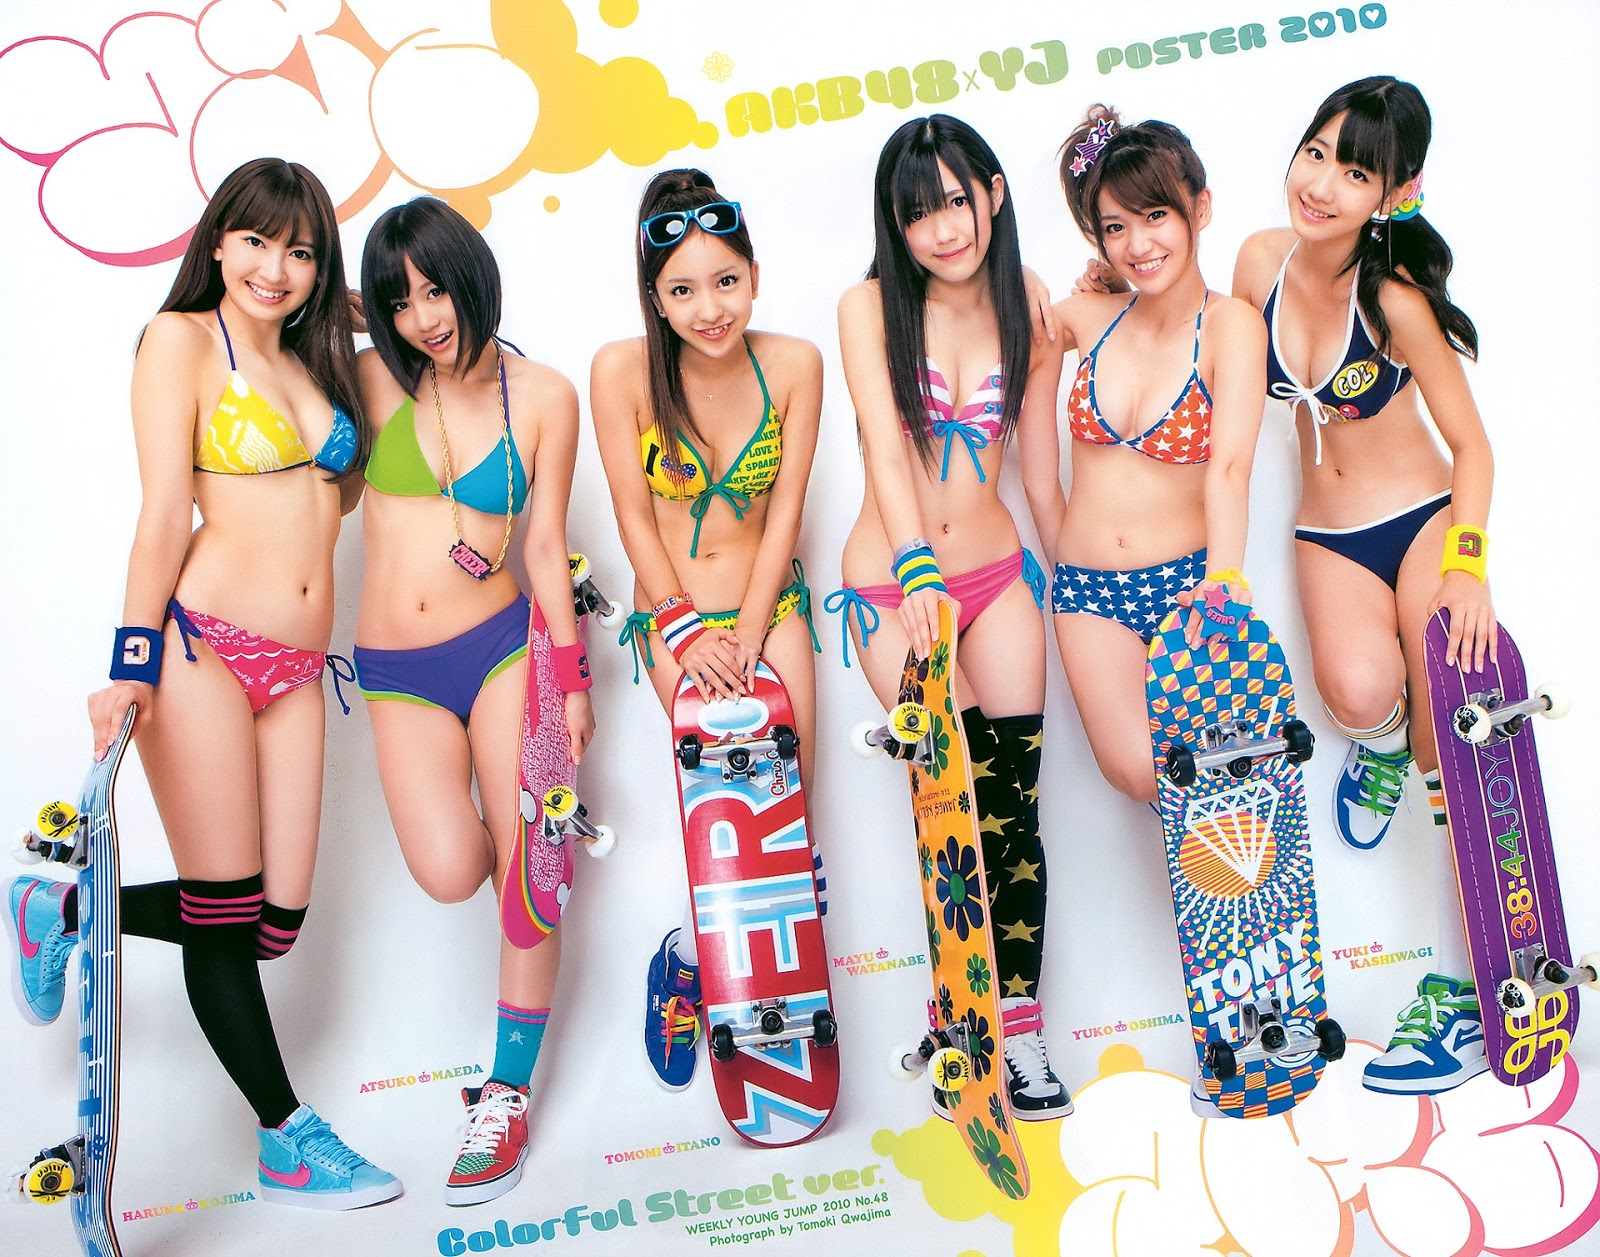 http://2.bp.blogspot.com/-vWDWxRVAVsw/UPvW2Kk2cLI/AAAAAAAAYiE/MvnQcmm-GDA/s1600/AKB48+Wallpaper+HD.jpg